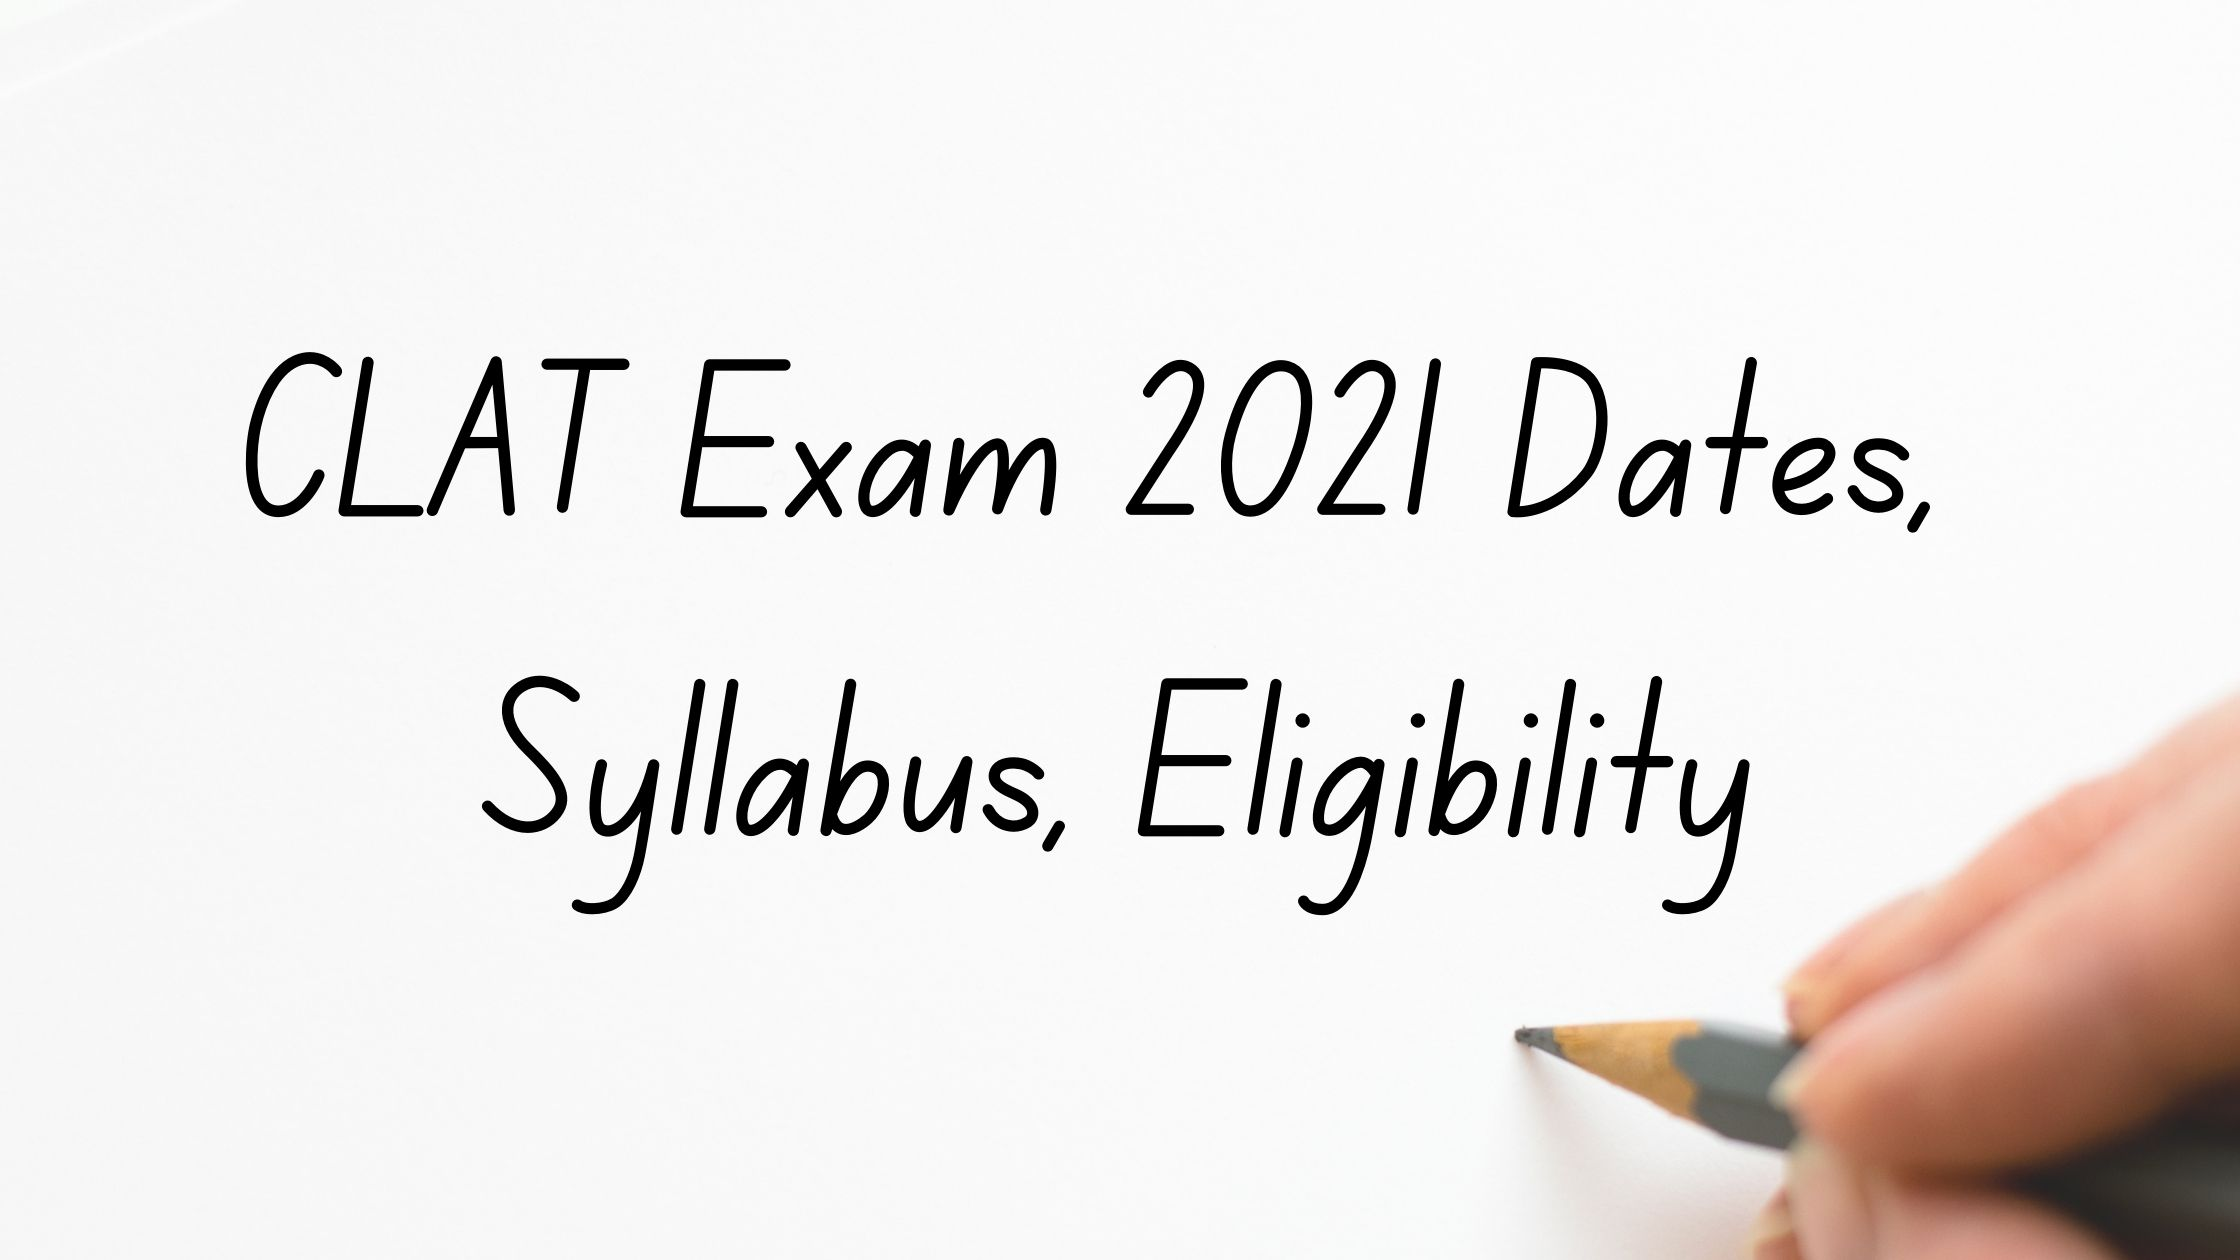 CLAT Exam 2021: CLAT Exam Dates, Syllabus, Eligibility